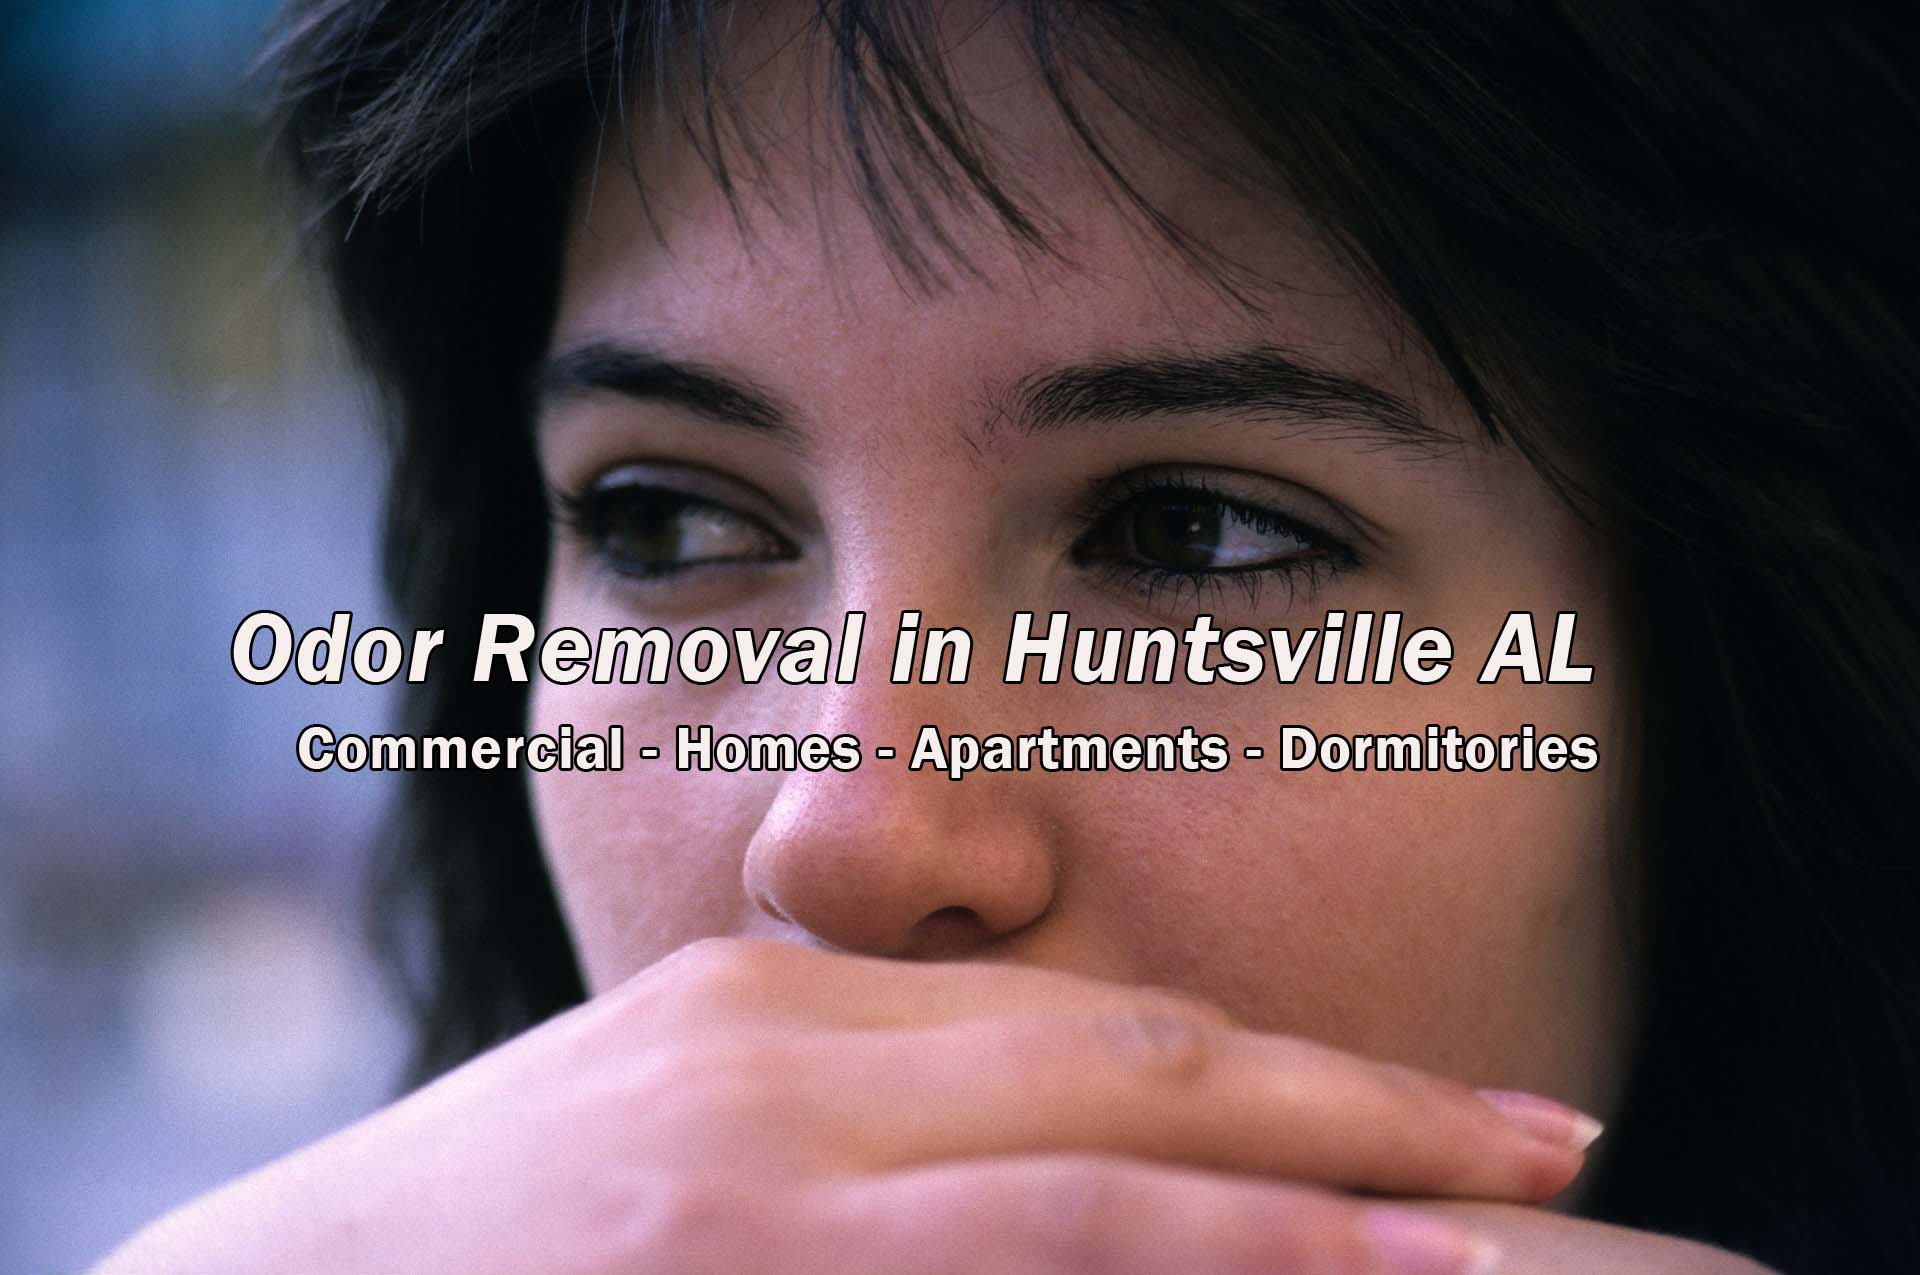 Huntsville al facial